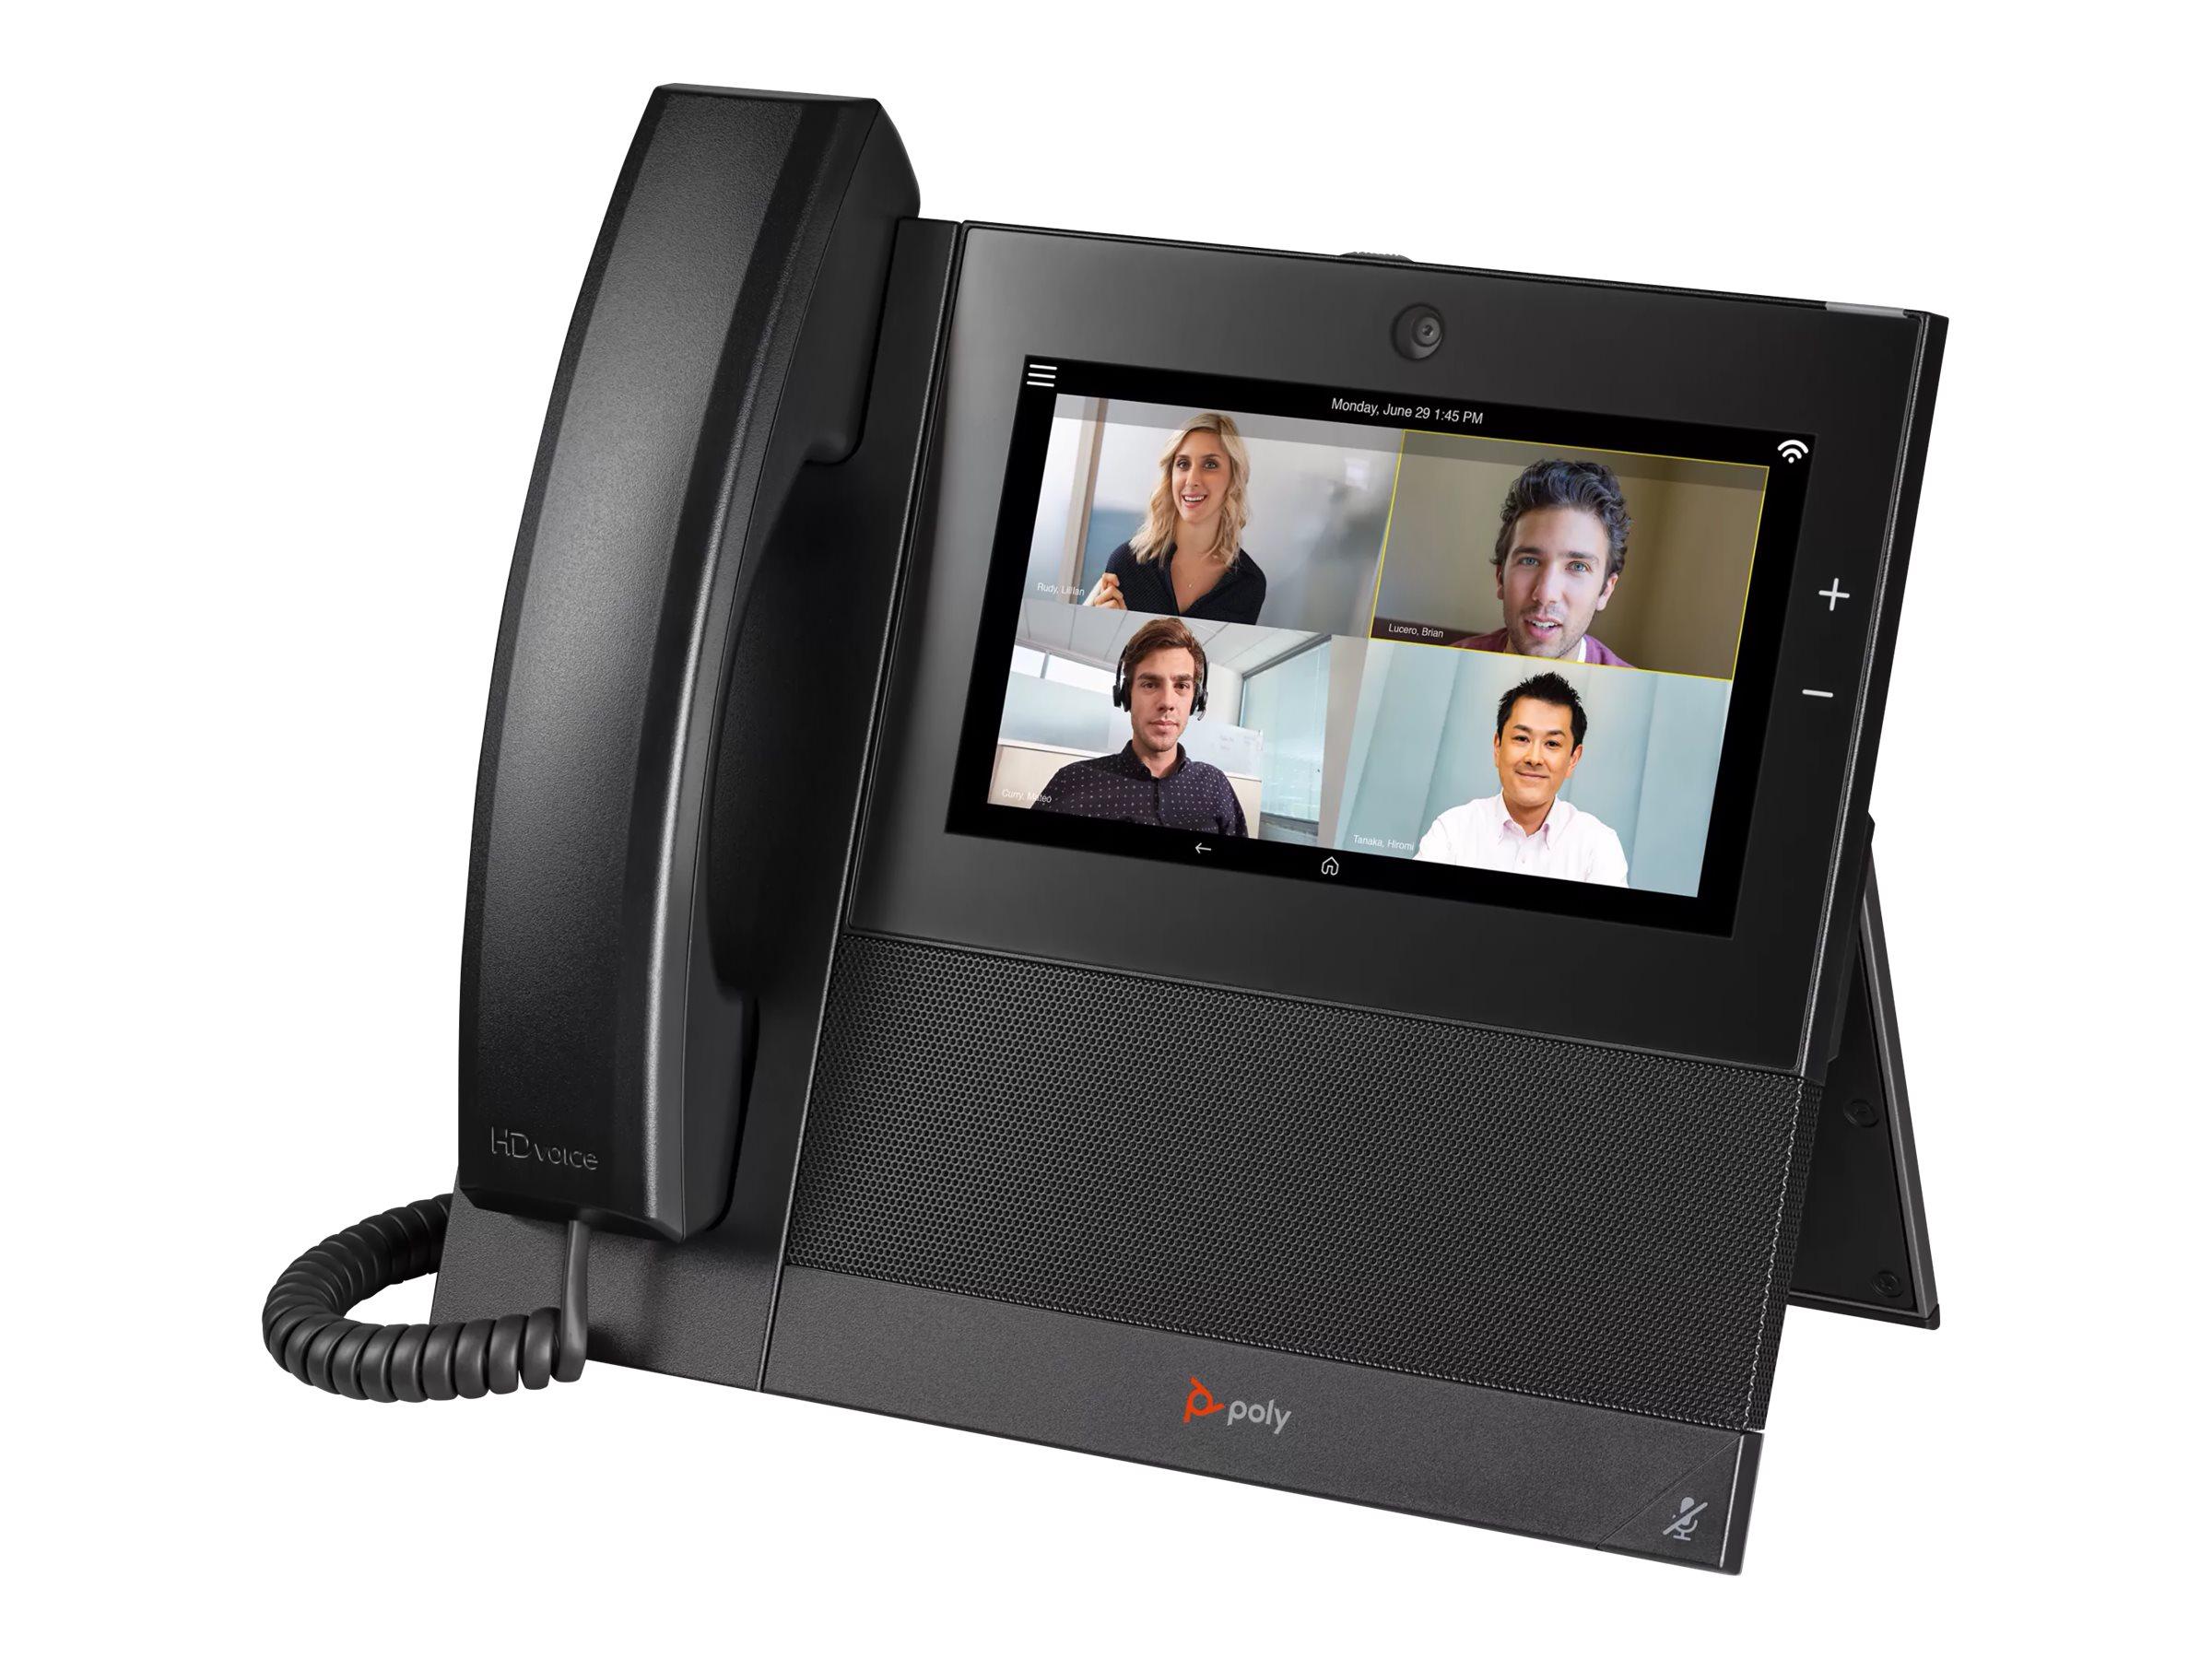 Poly CCX 700 OpenSIP - VoIP-Telefon - SIP, RTCP, RTP, SDP